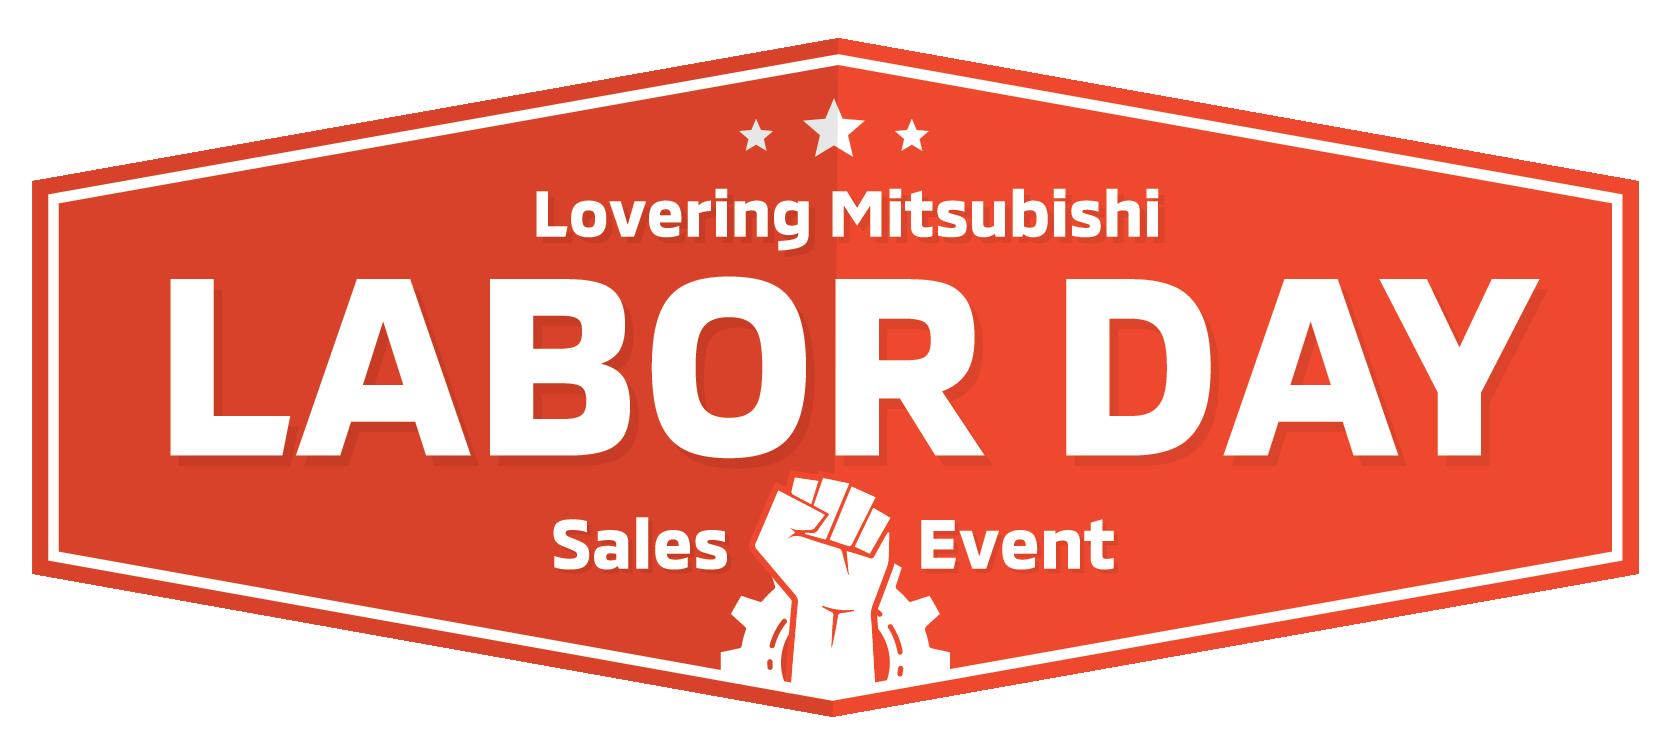 Mitsubishi Labor Day Logo